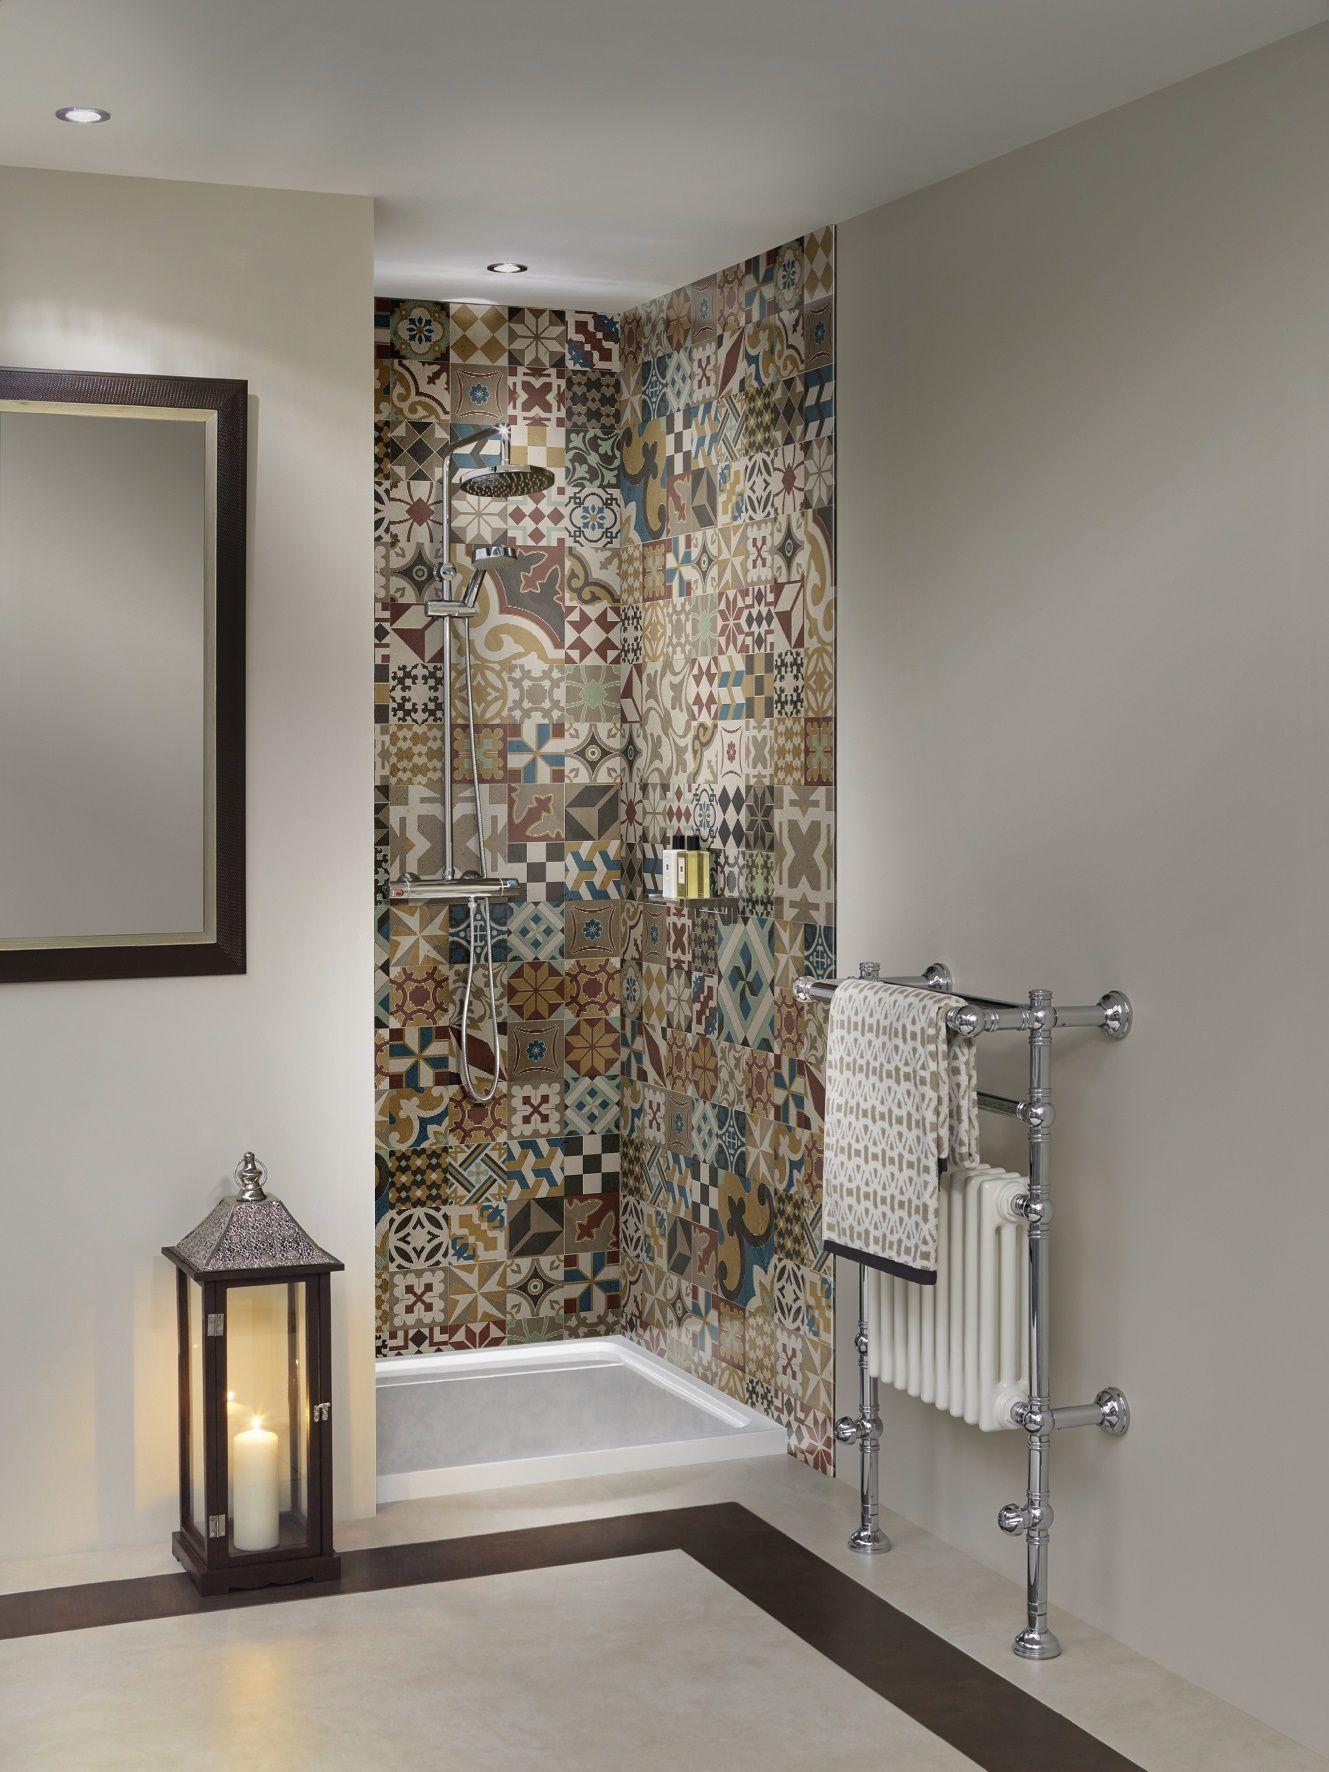 Bushboard Nuance Bathroom Wall Panels Bathroom Inspiration Decor Shower Wall Panels